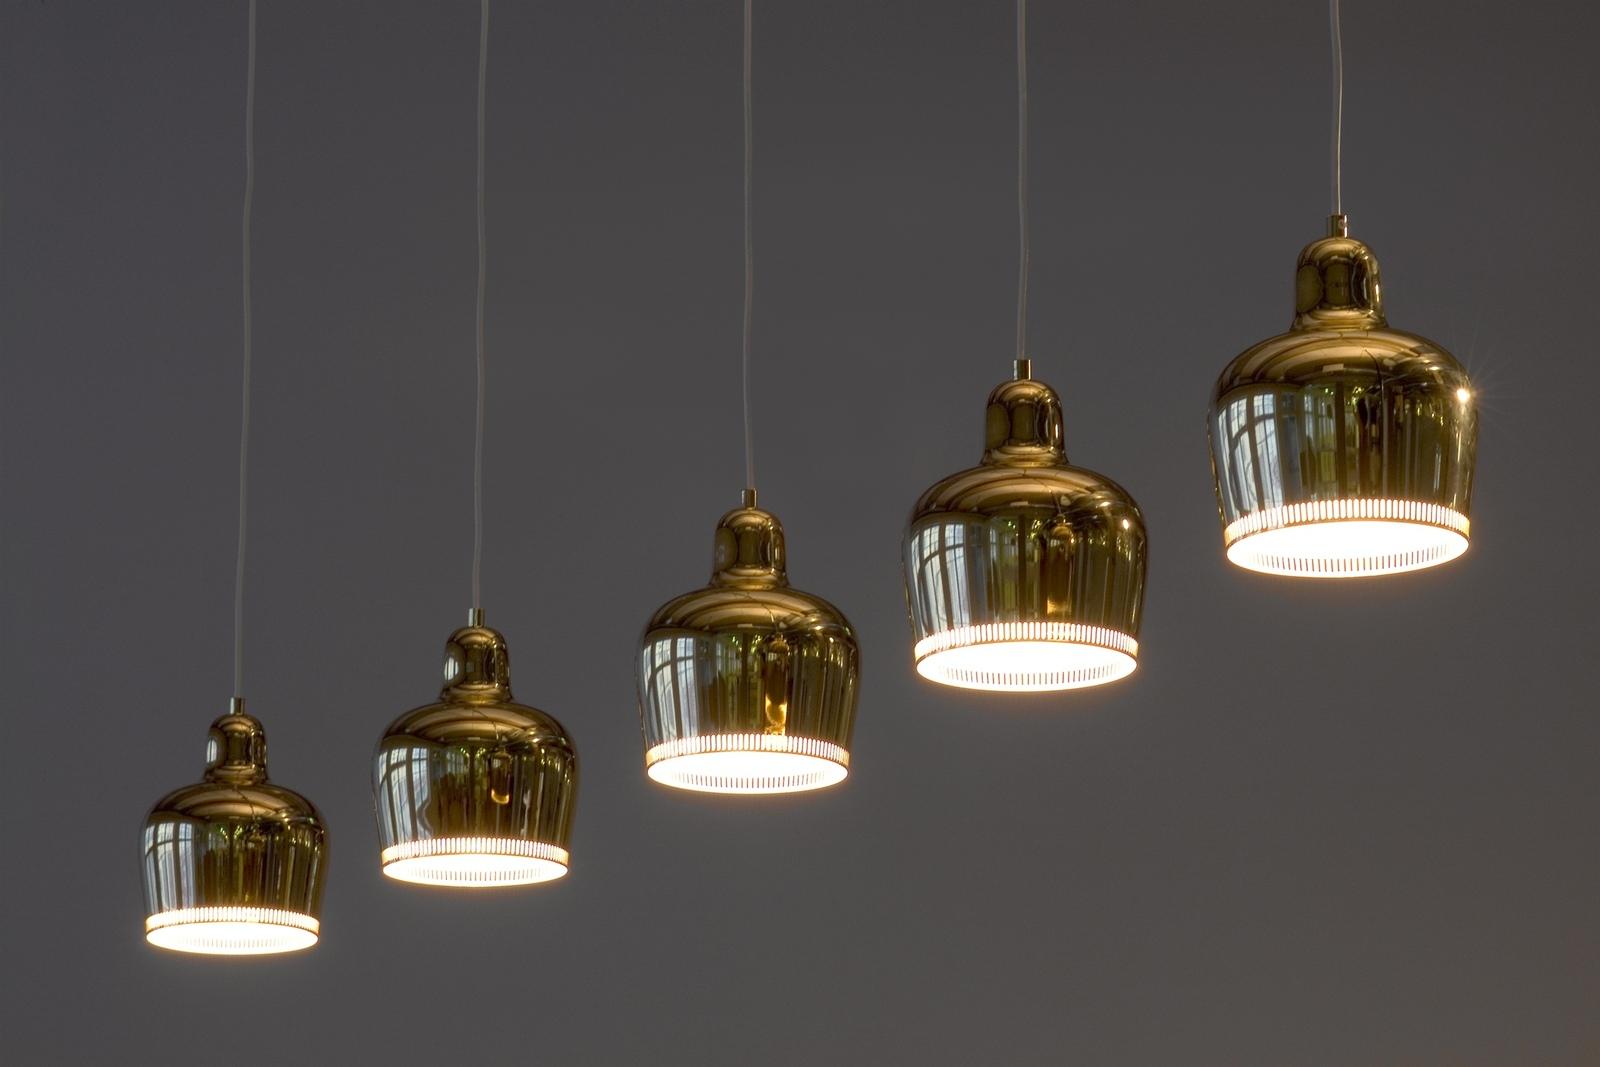 Messing Pendler Lampe - Finsk lampedesign Skandinaviskdesign dk